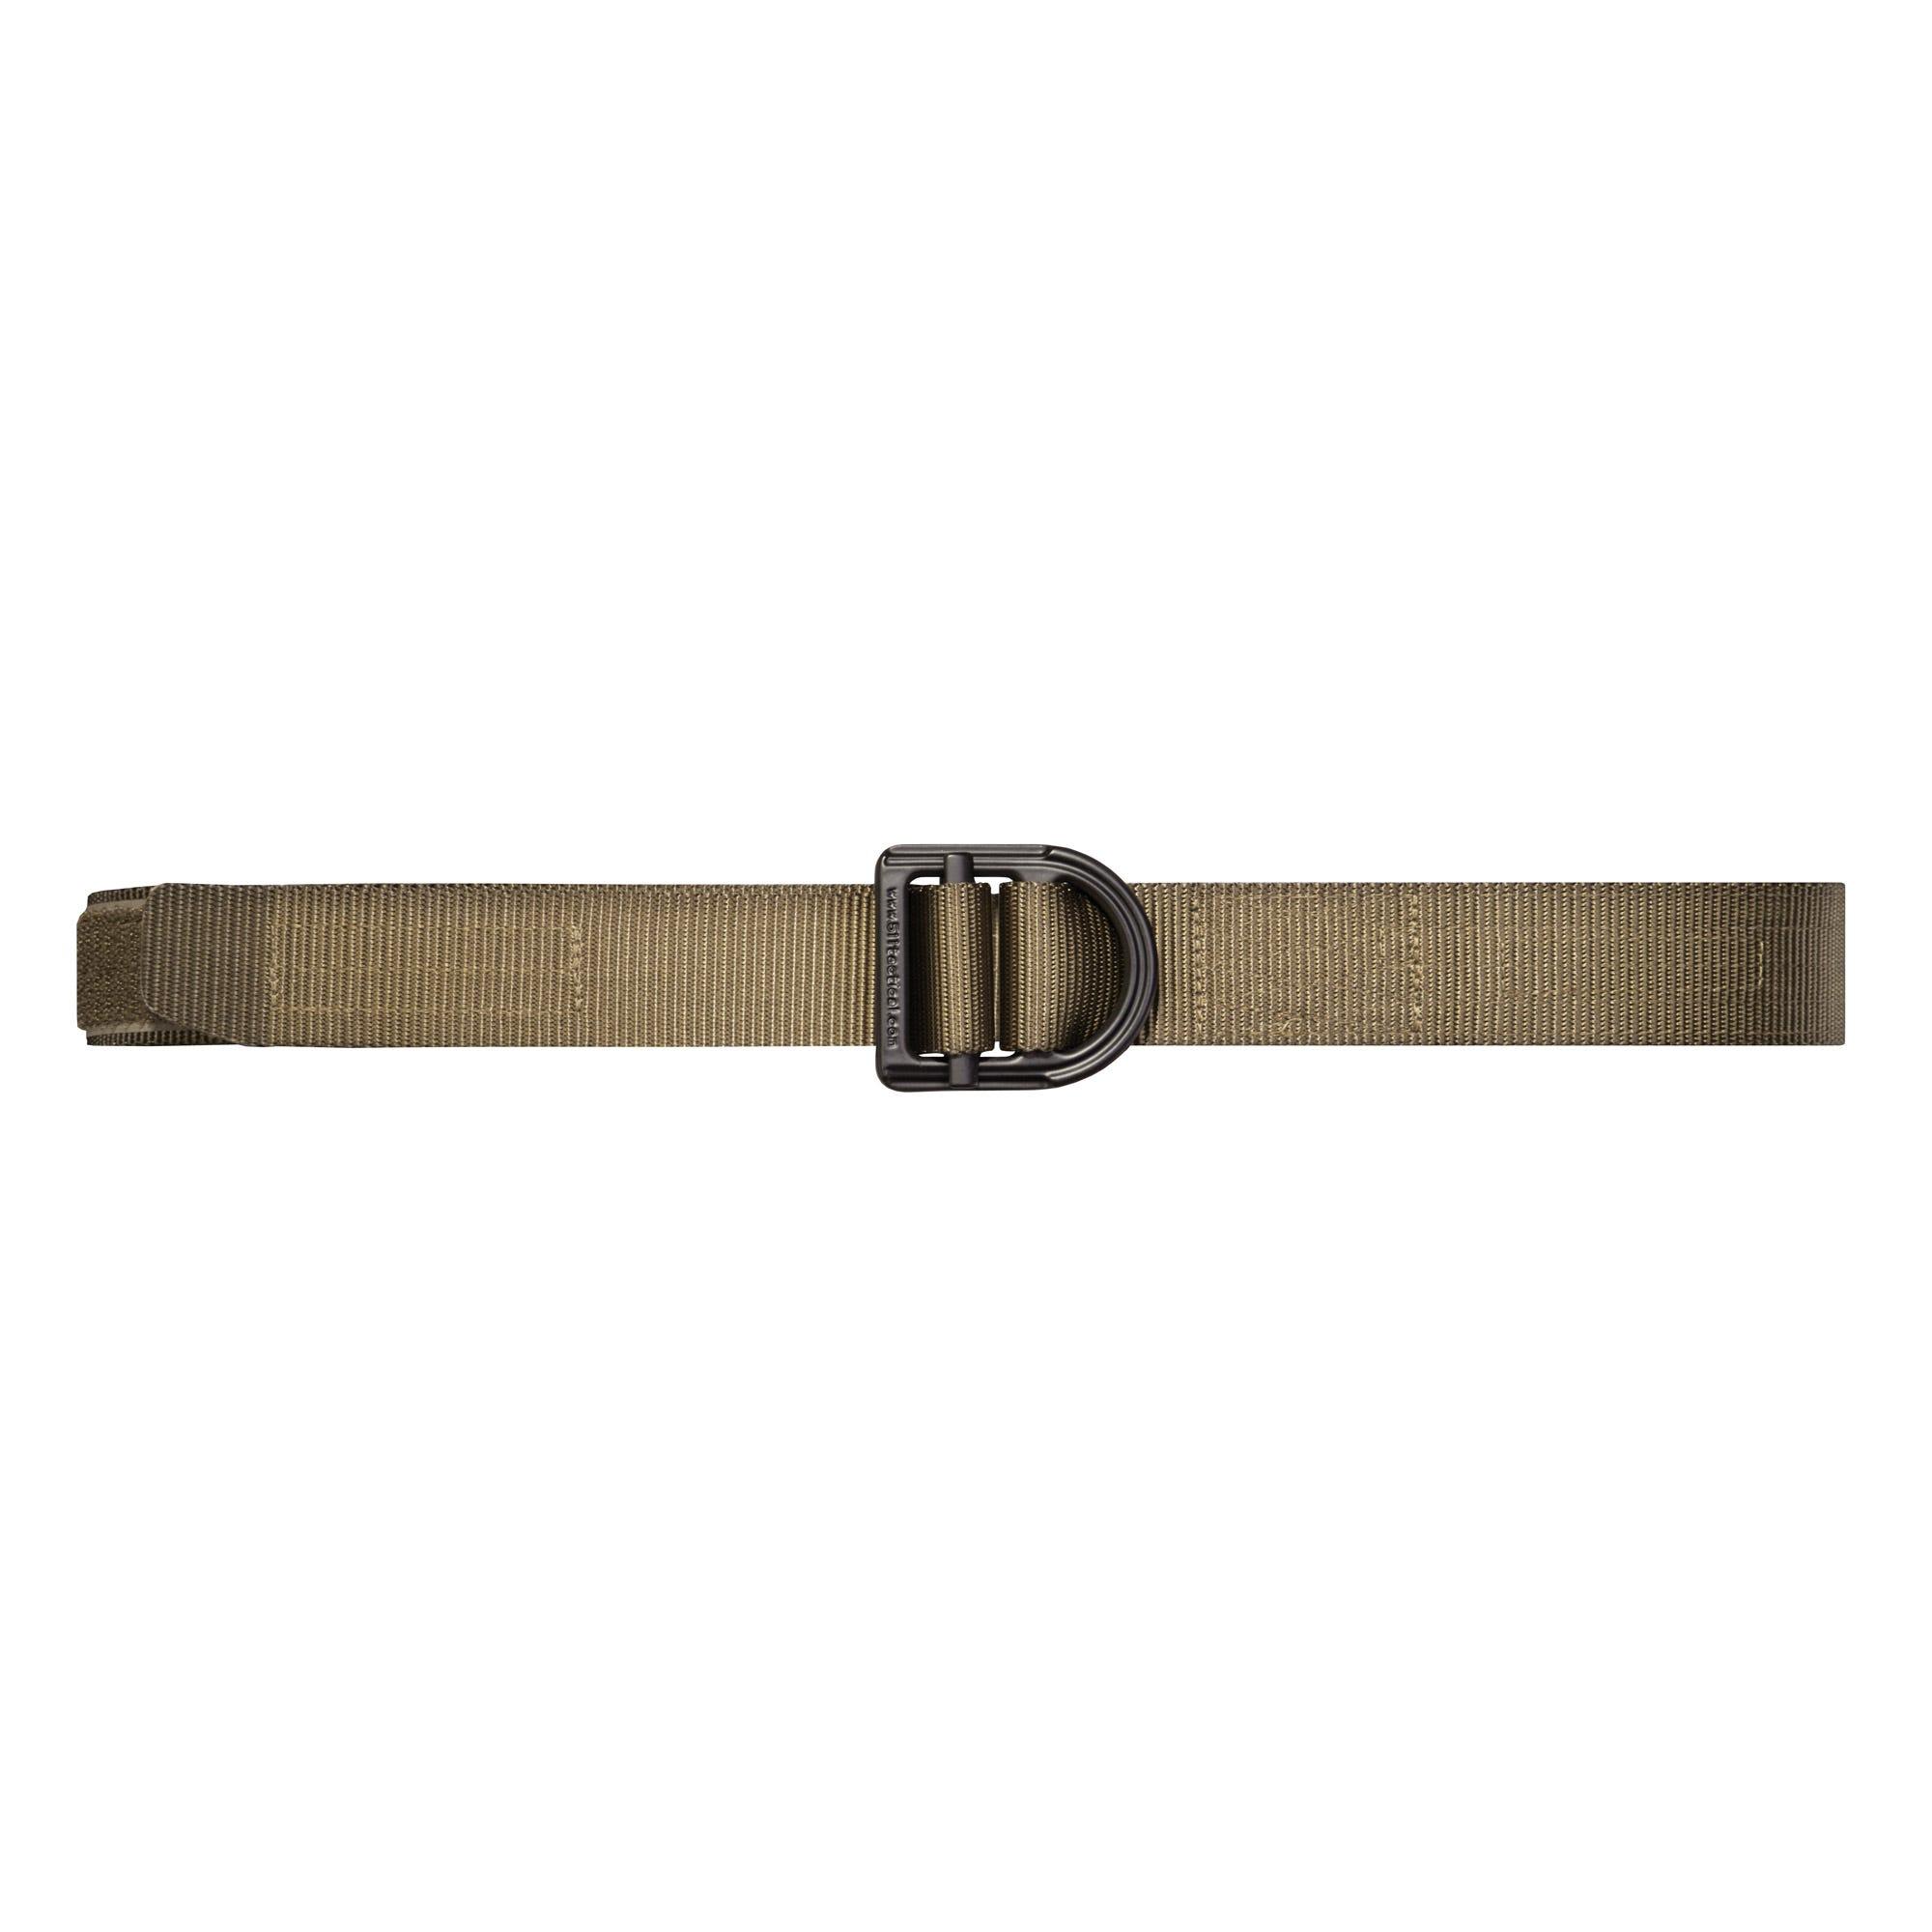 "1.5"" Trainer Belt"